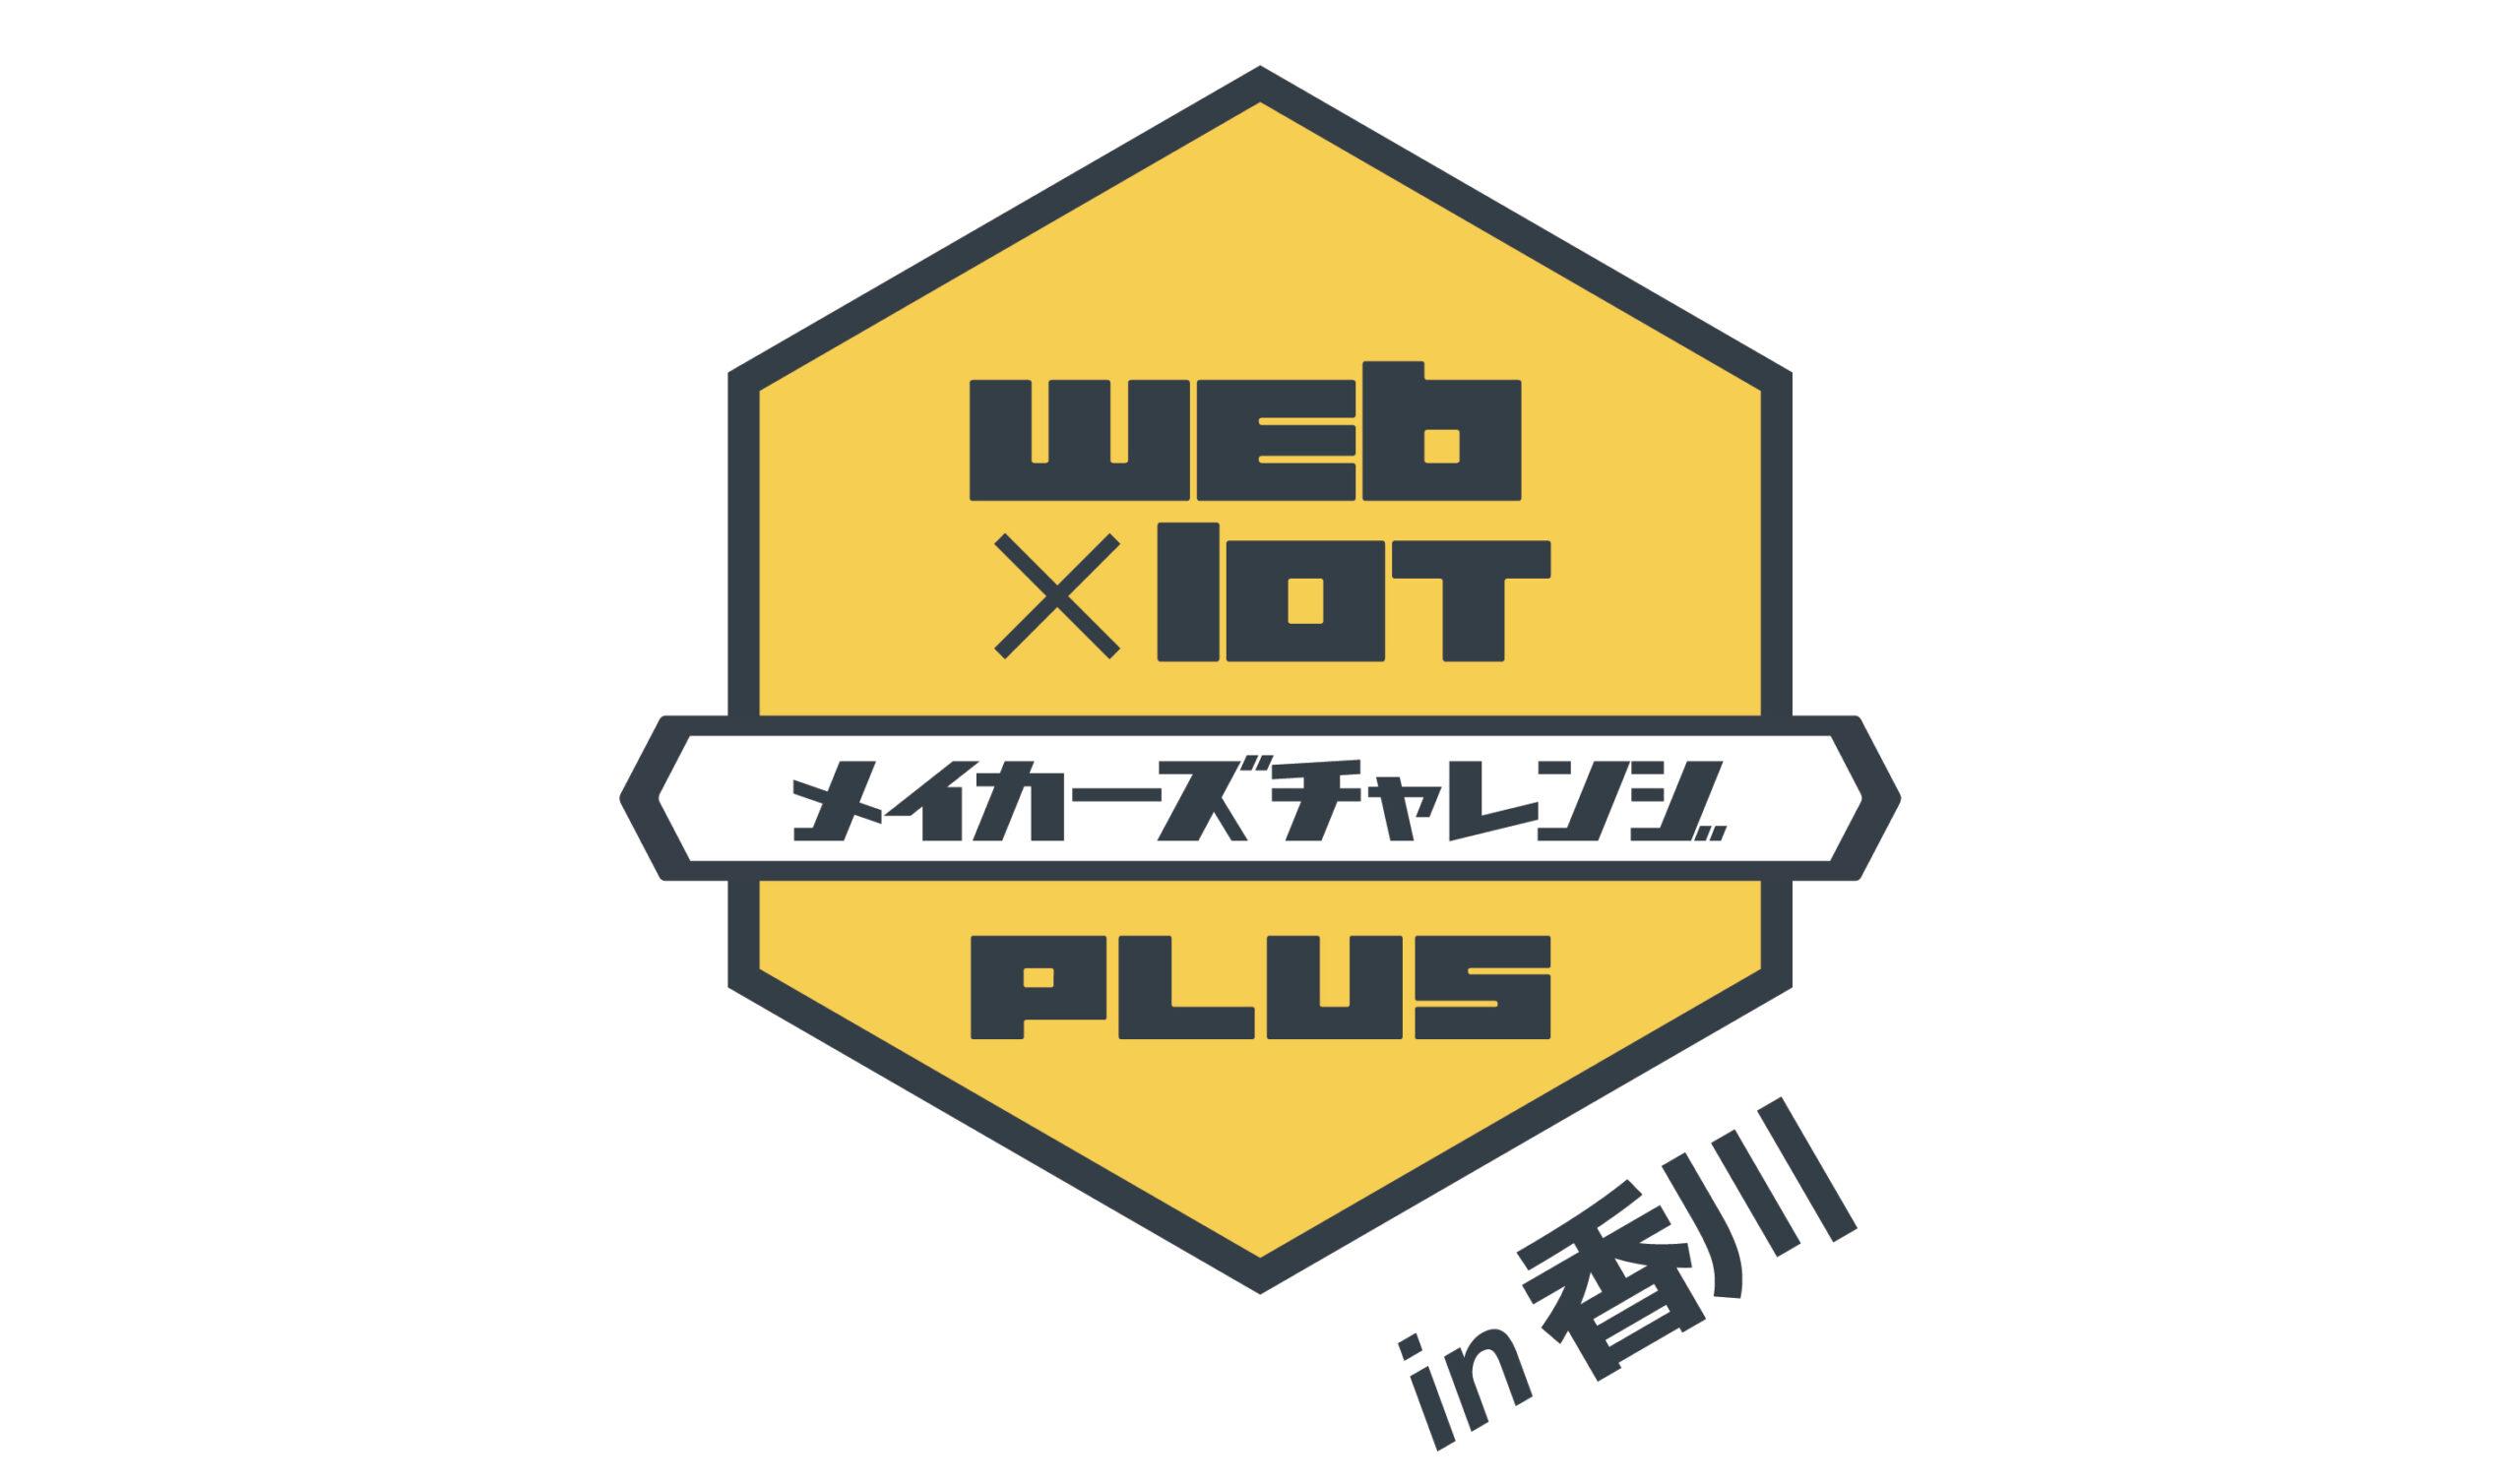 Web×IoT メイカーズチャレンジ PLUS in 香川